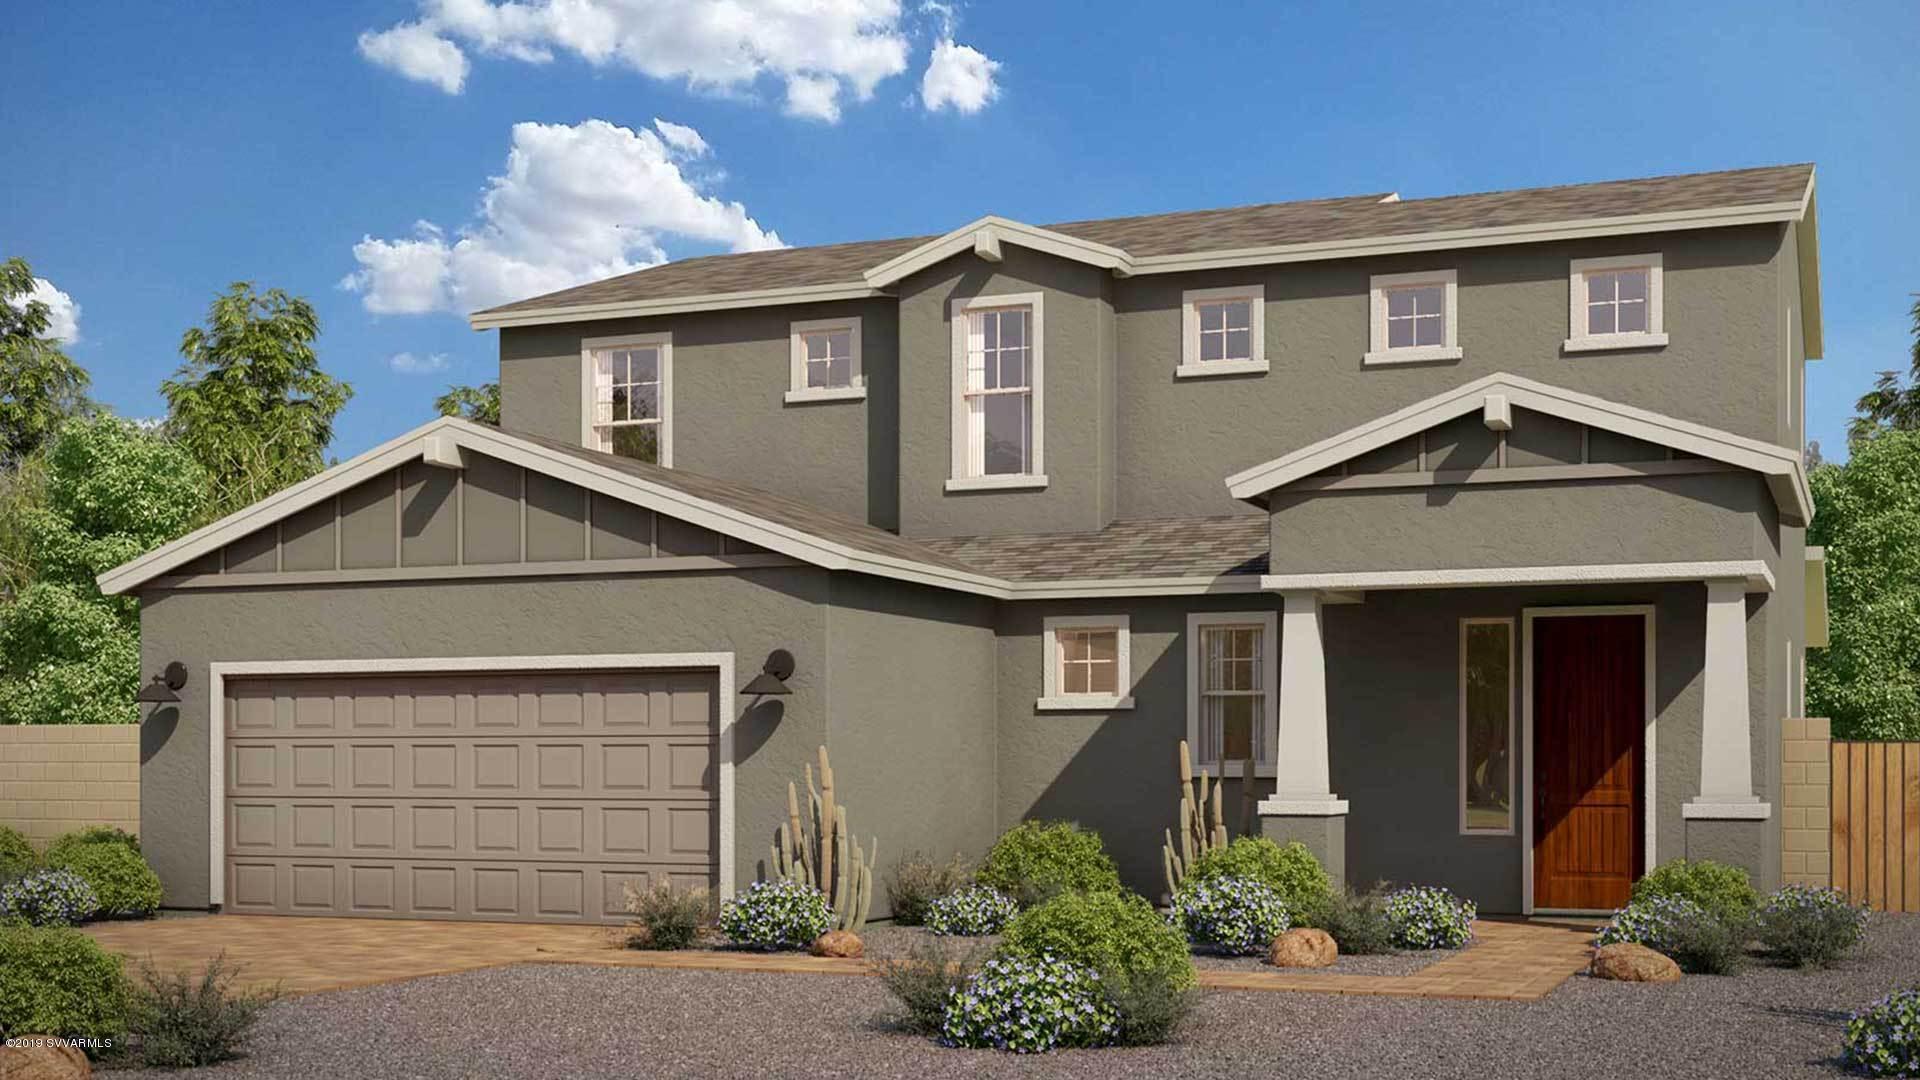 431 Mckinnon Rd Clarkdale, AZ 86324